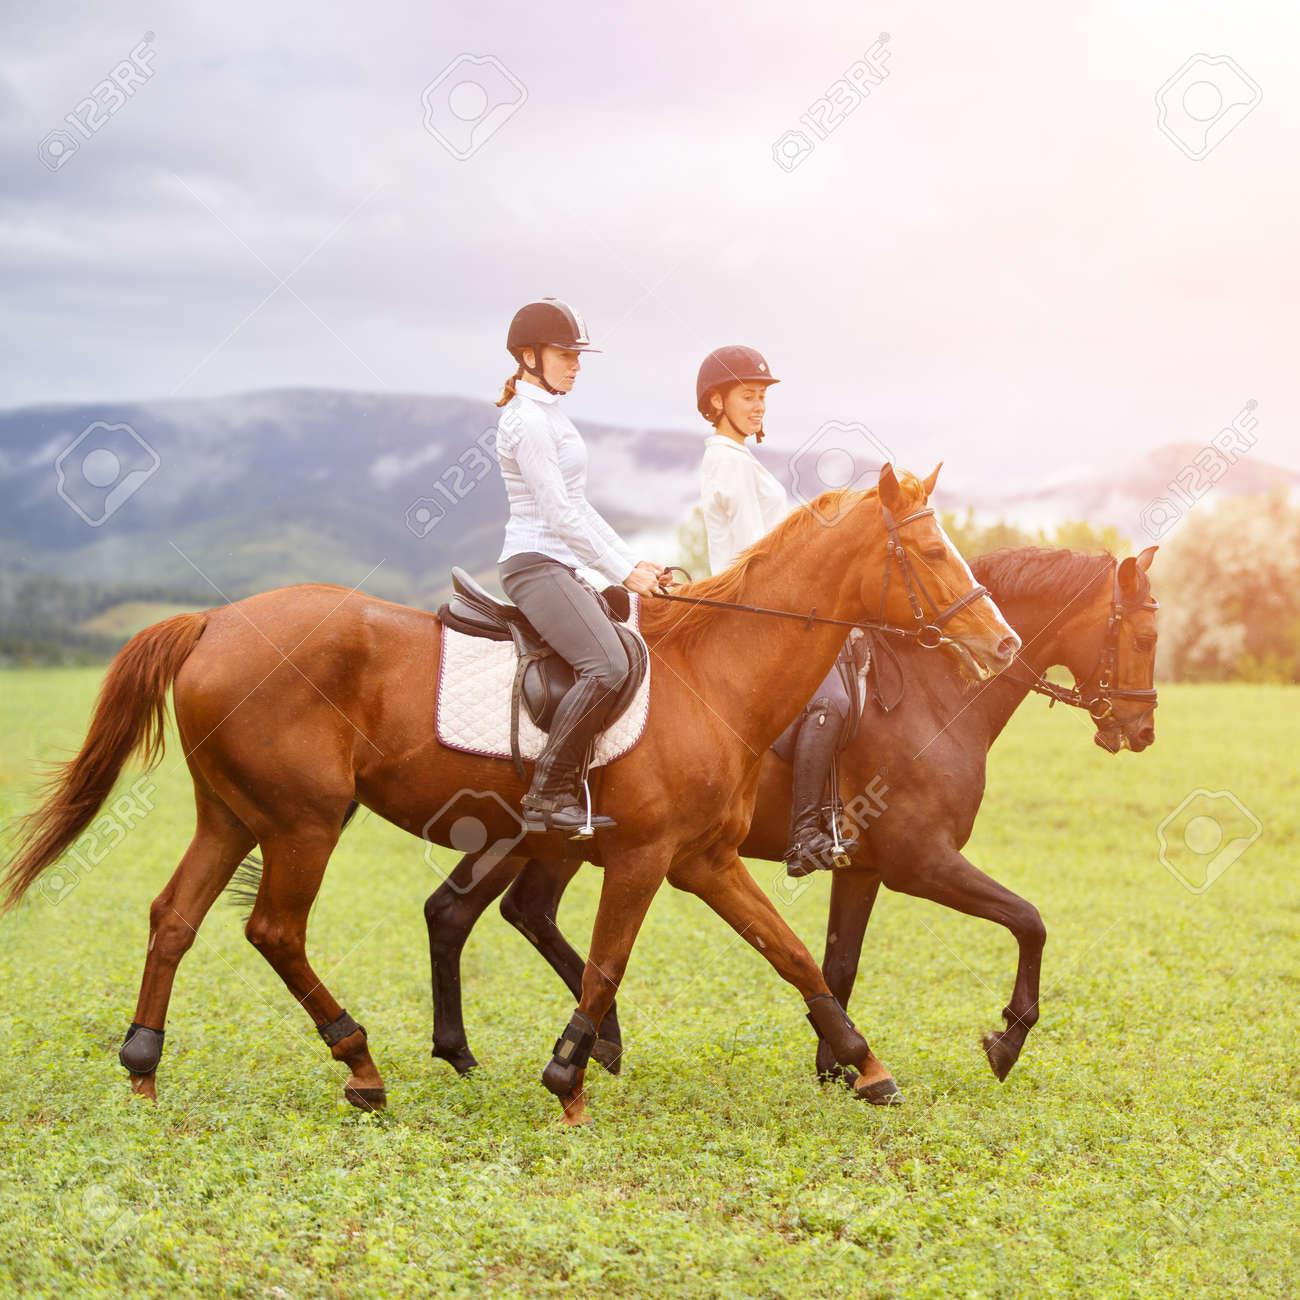 Frauen reiten Reiten